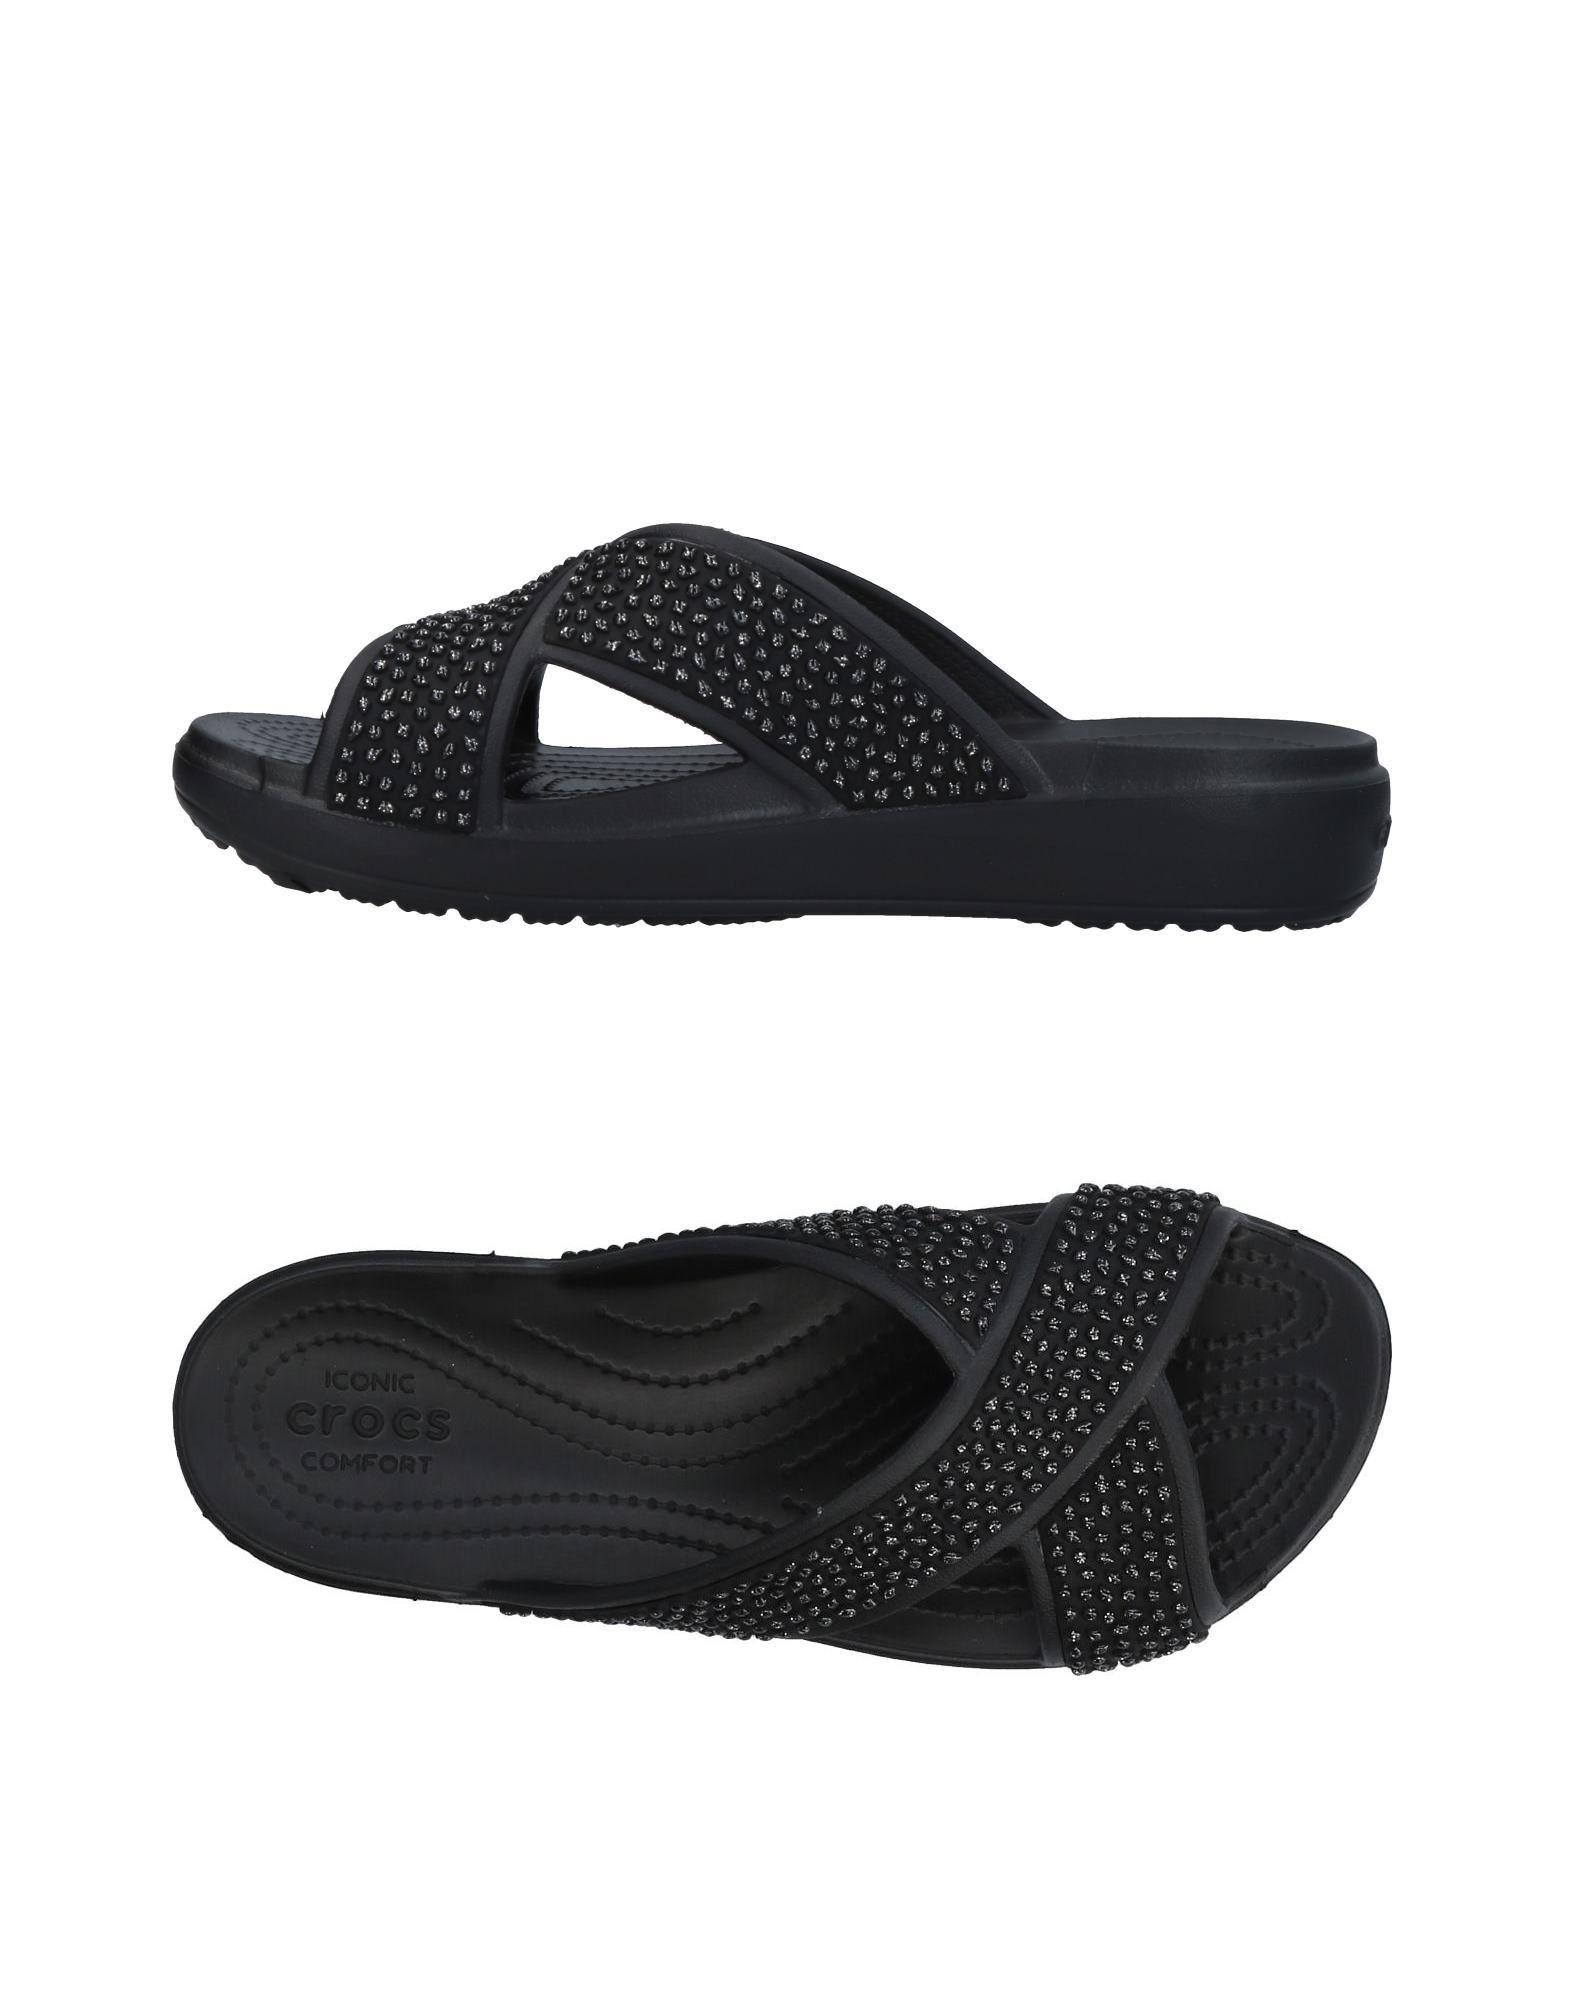 Sandali Crocs Donna - 11442017OE comode Scarpe comode 11442017OE e distintive 9027fe